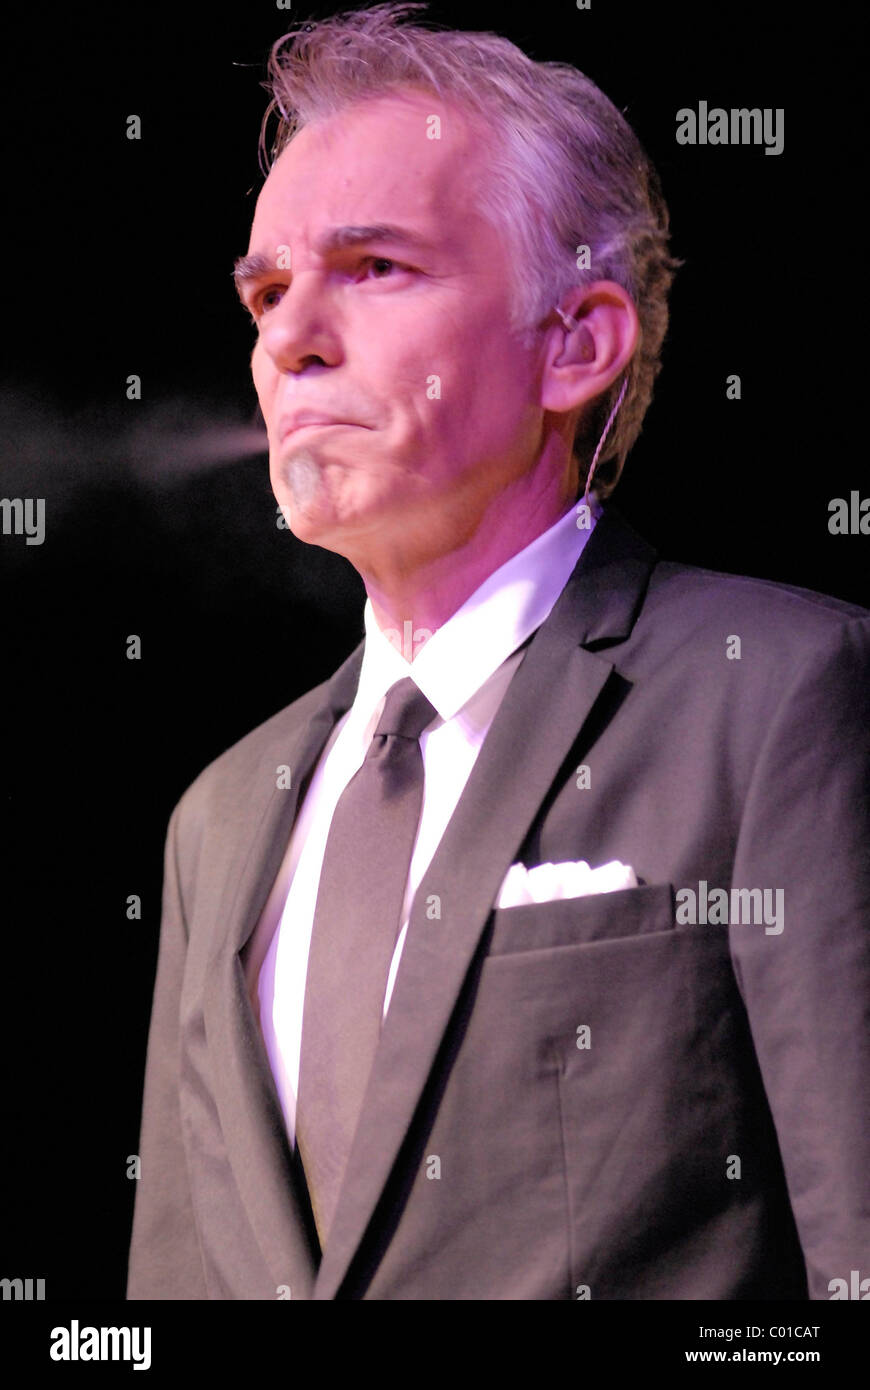 Billy Bob Thornton - 2020 Grey hair & hair style.